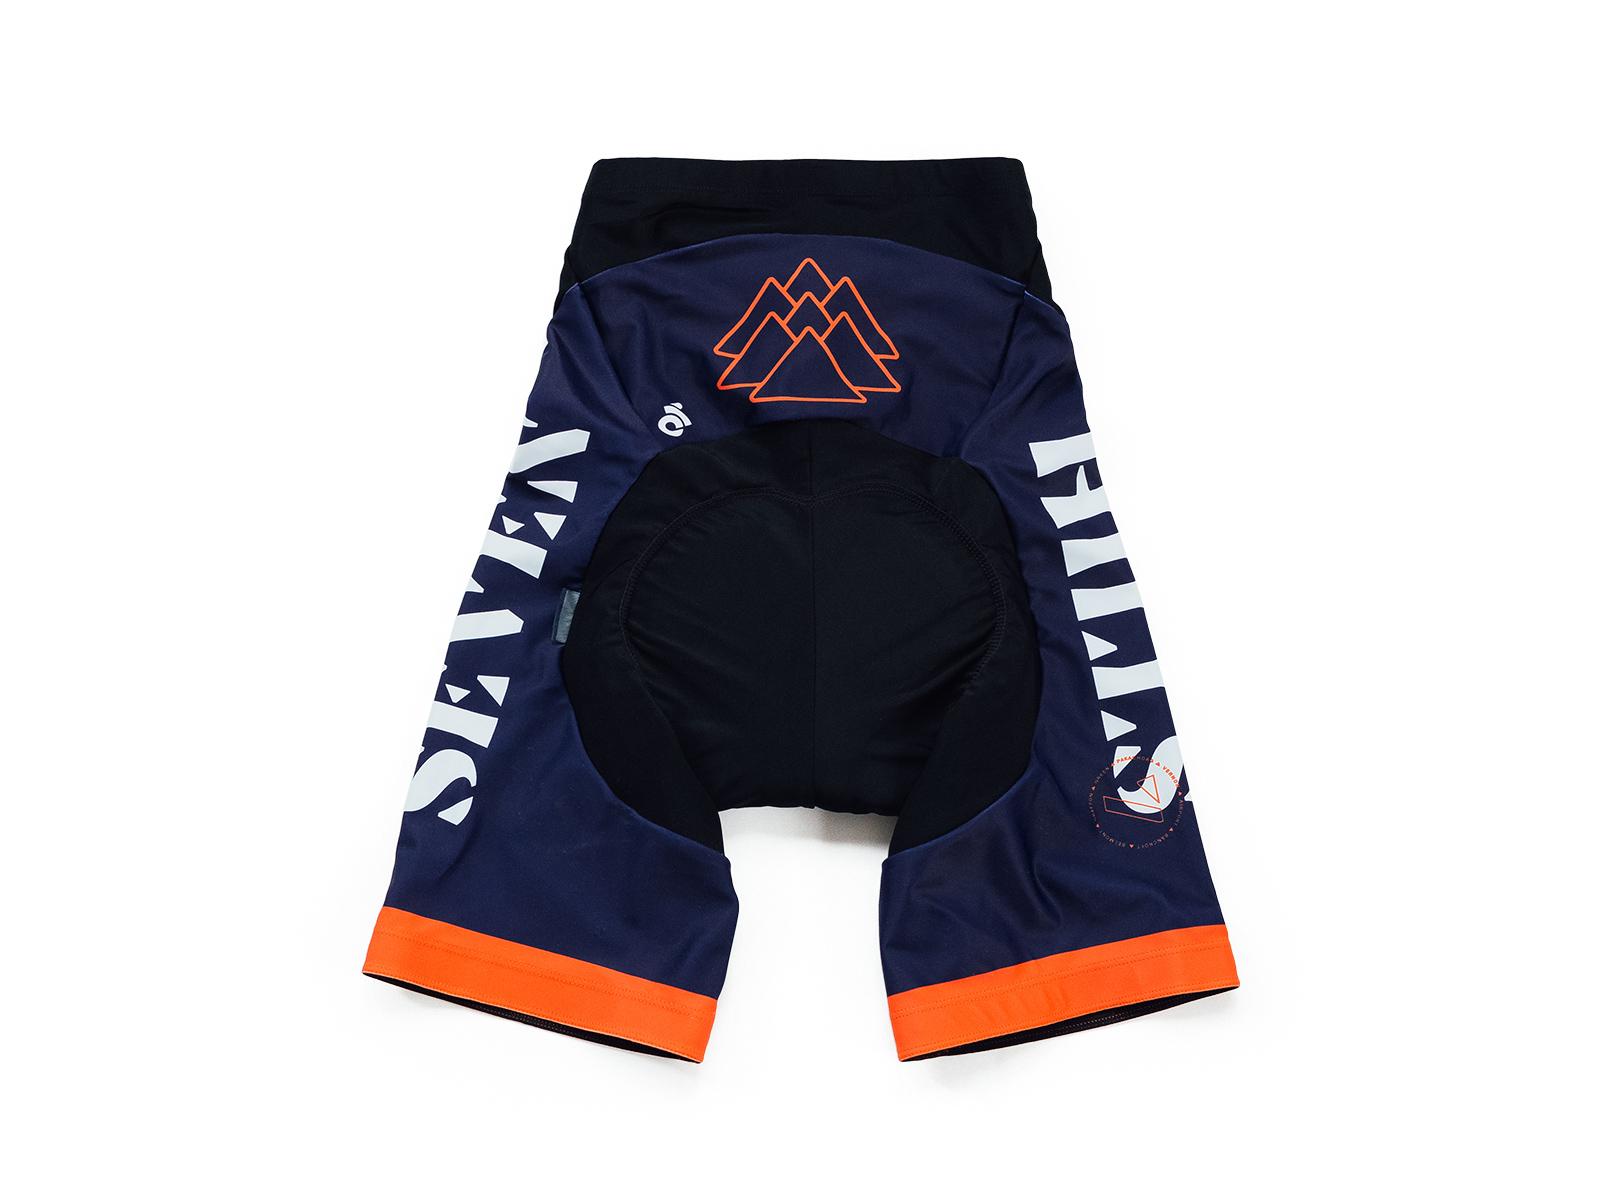 Personal-7HW-Jersey-Shorts-1600.jpg